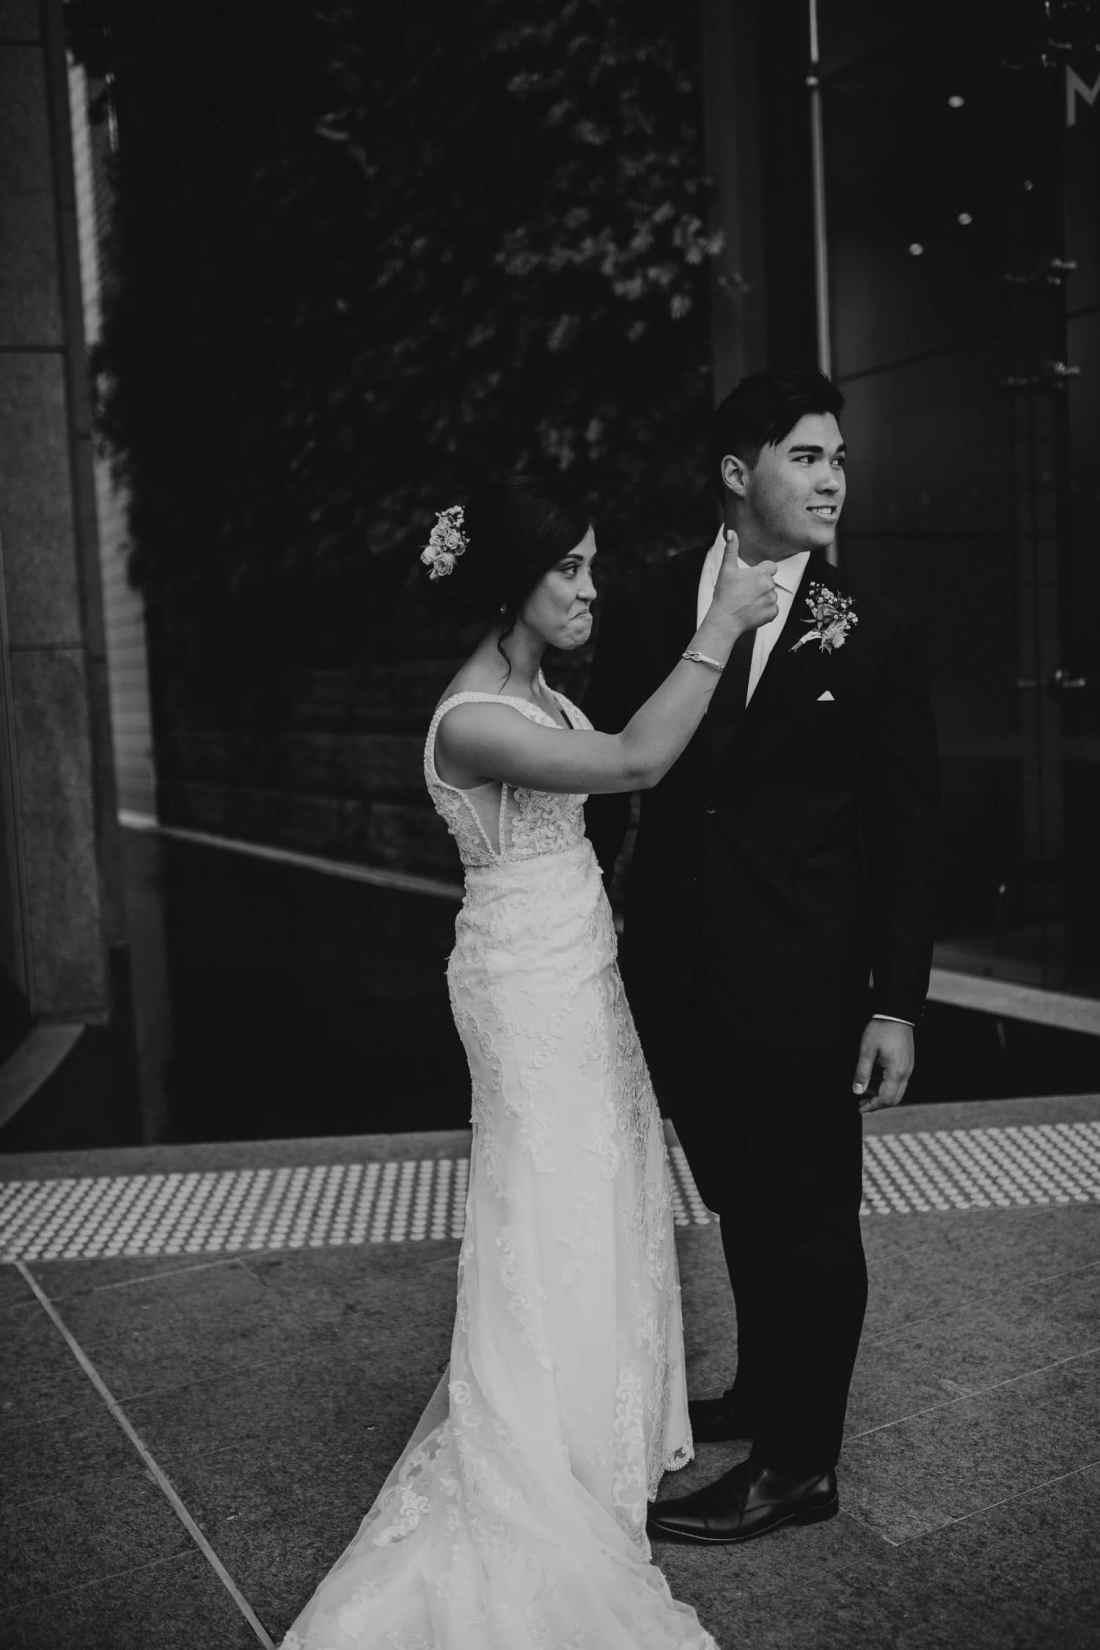 Ebony Blush Photography | Perth Wedding Photographer | Photography + Film | Sandalford Winery | Como Treasury Wedding | Perth City Wedding |Alex + Mel73